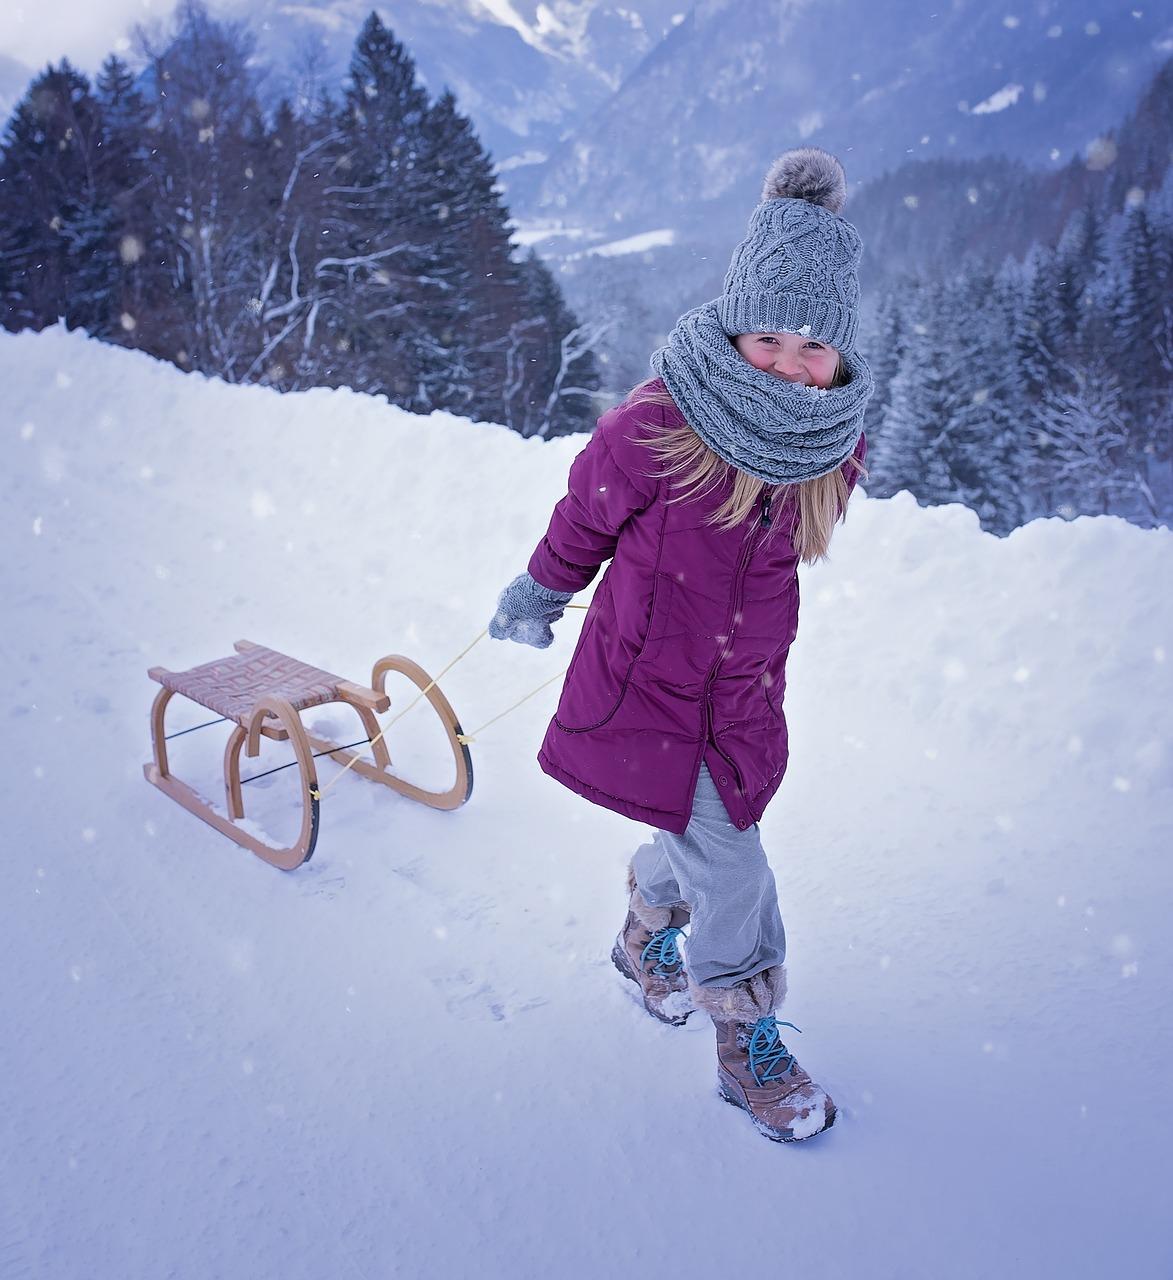 Buty zimowe dla dziewczynek Bartek. Jak kupować buty dla dziecka? Buty komunijne dla dziewczynek Lublin